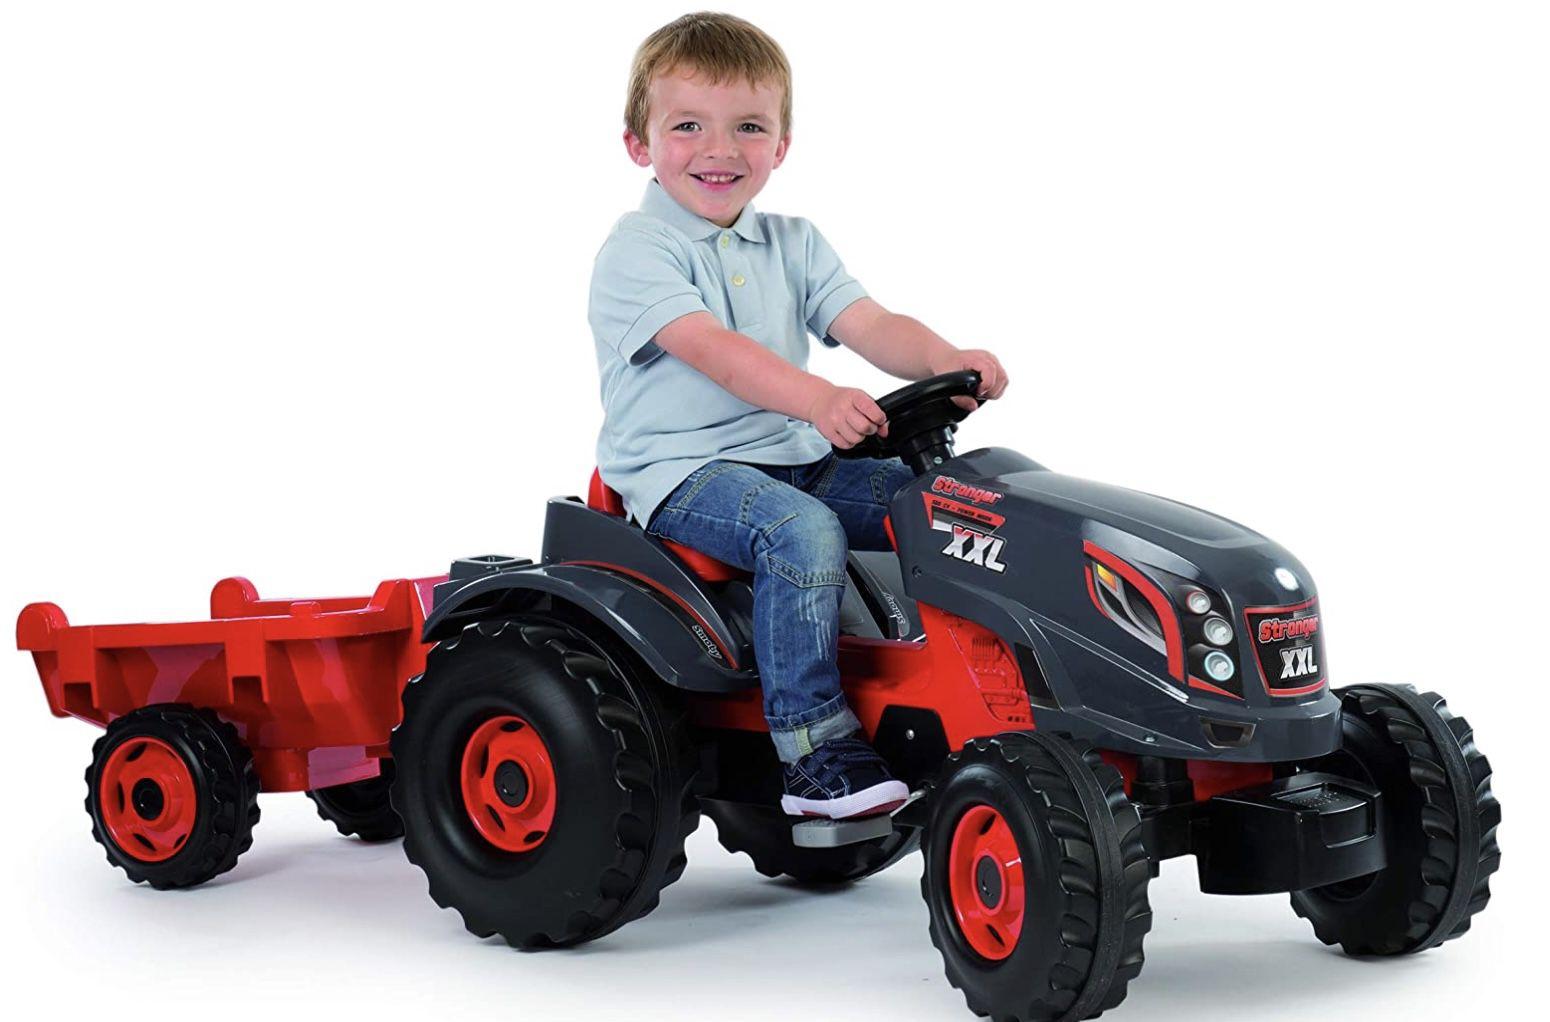 Smoby Traktor Stronger XXL Trettraktor mit Anhänger für 88,74€ (statt 117€)